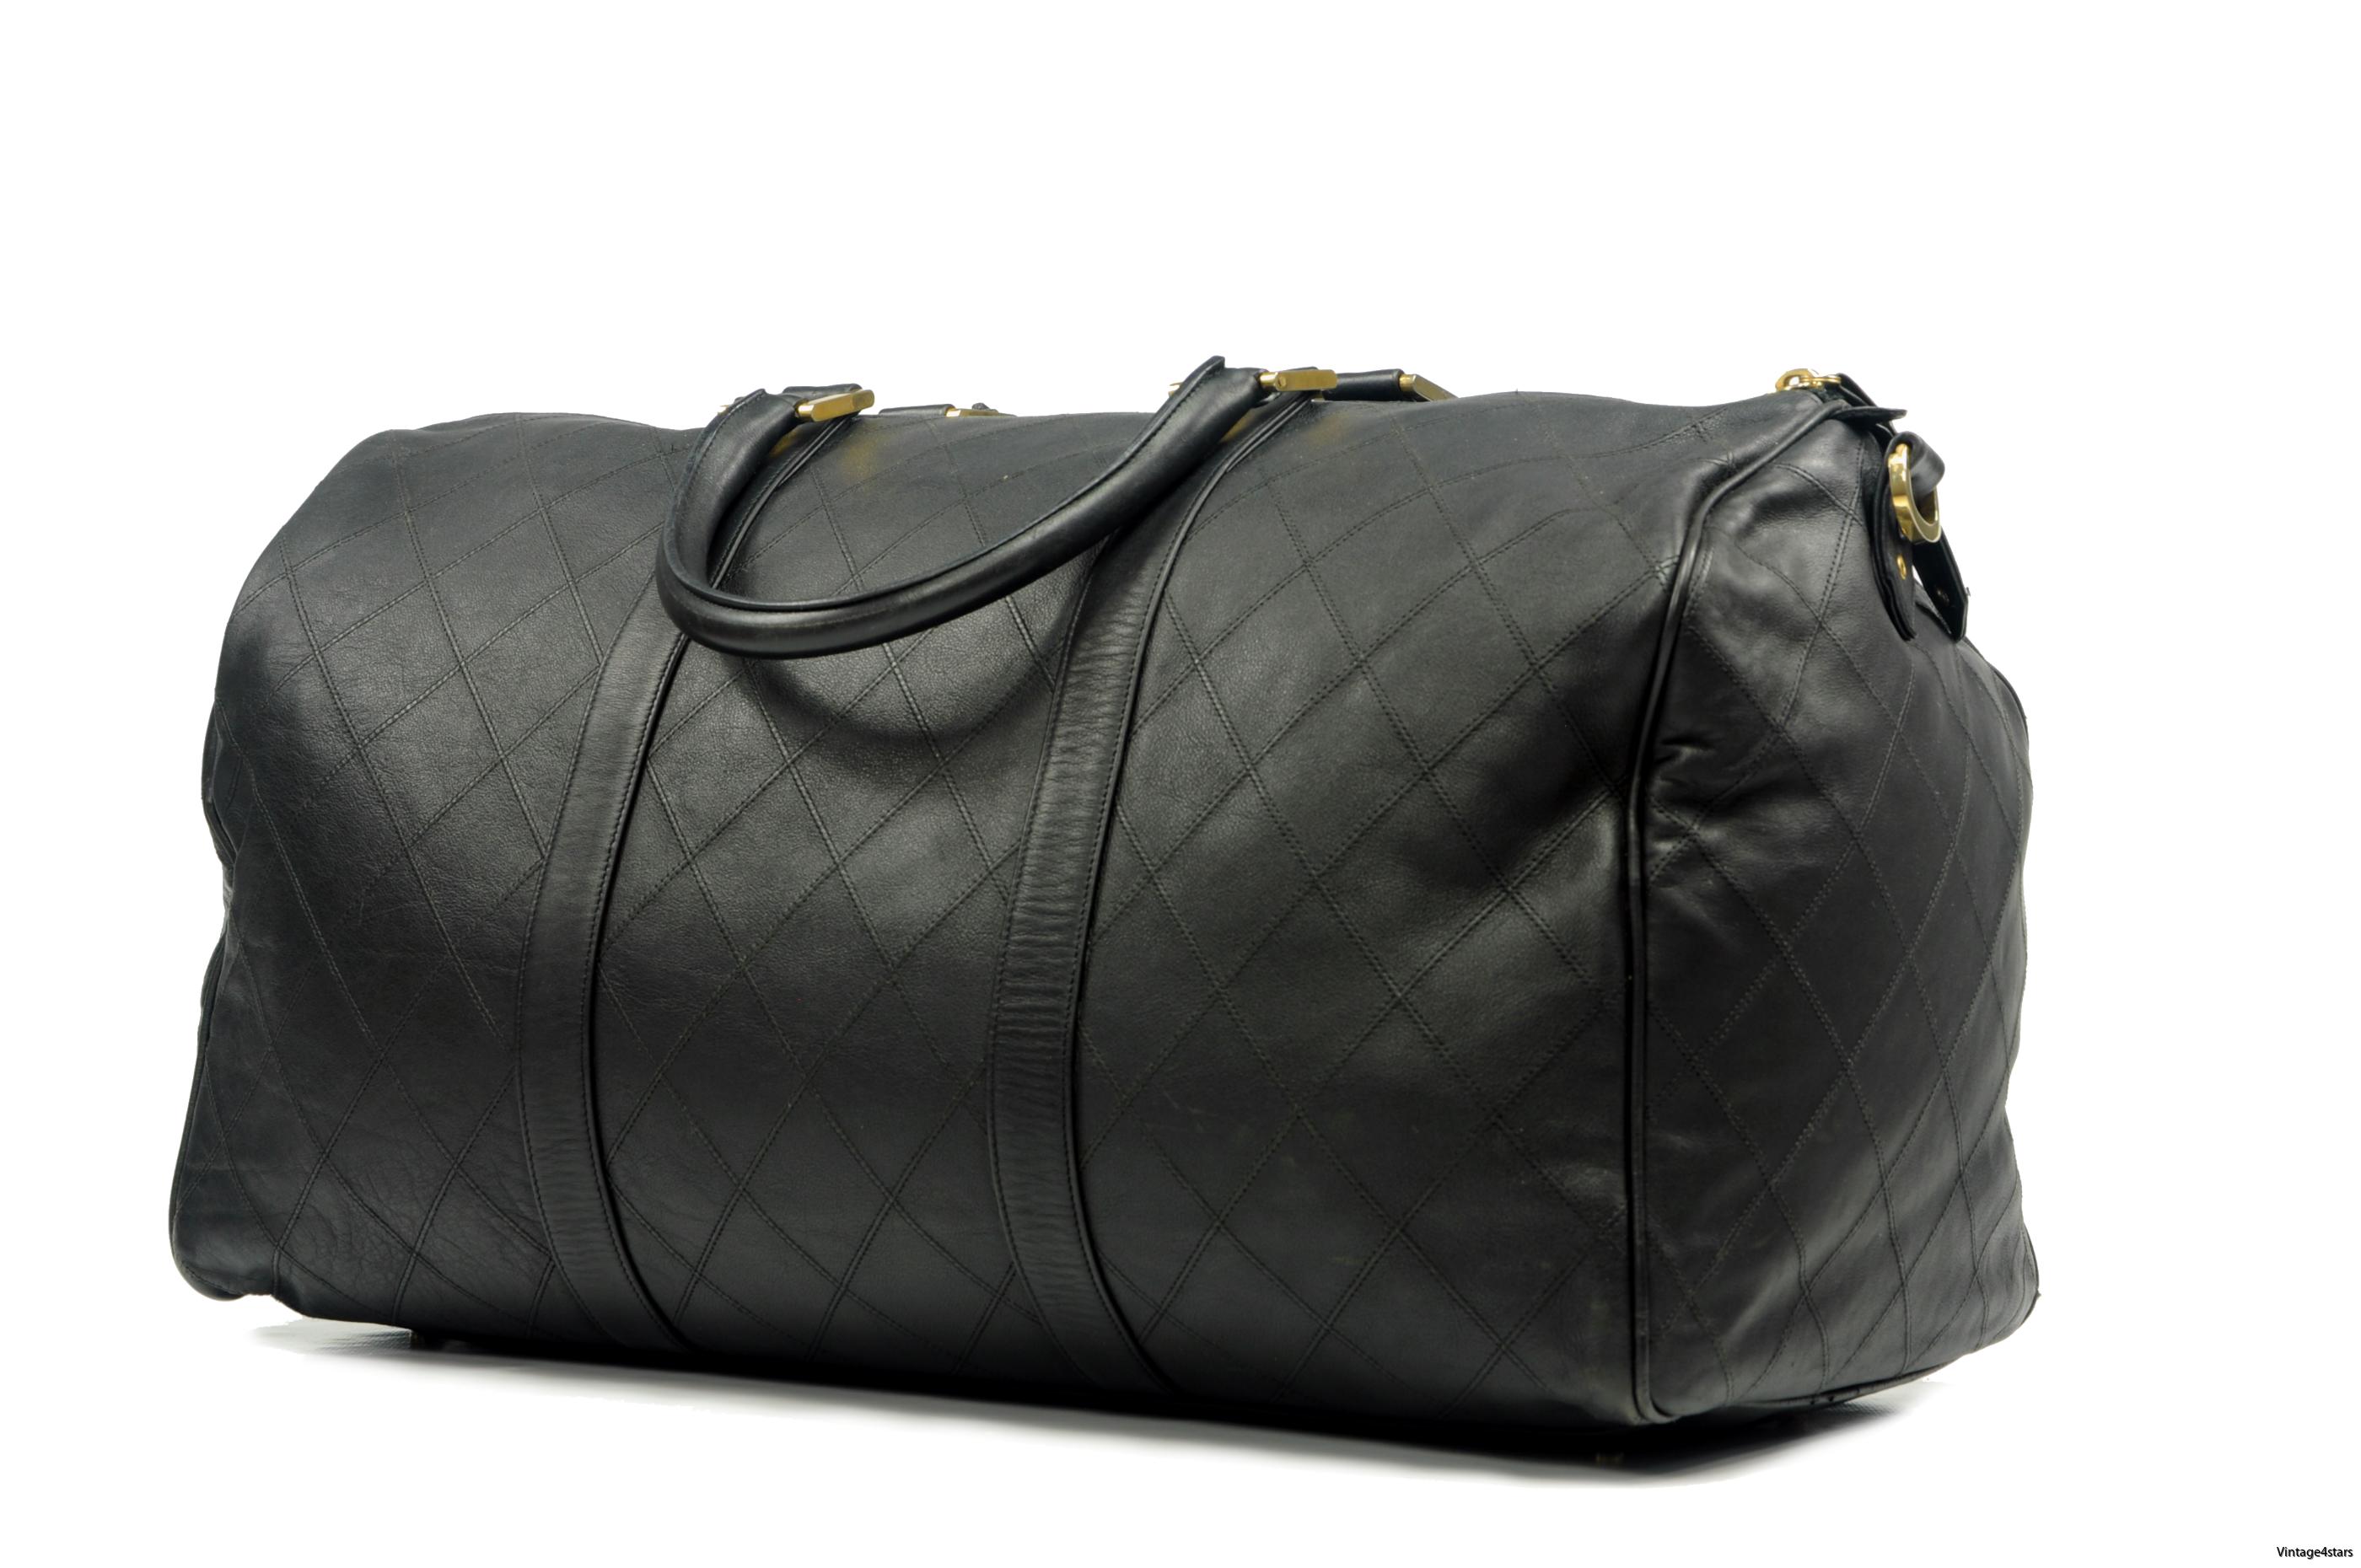 CHANEL Duffle Bag Calfskin 2